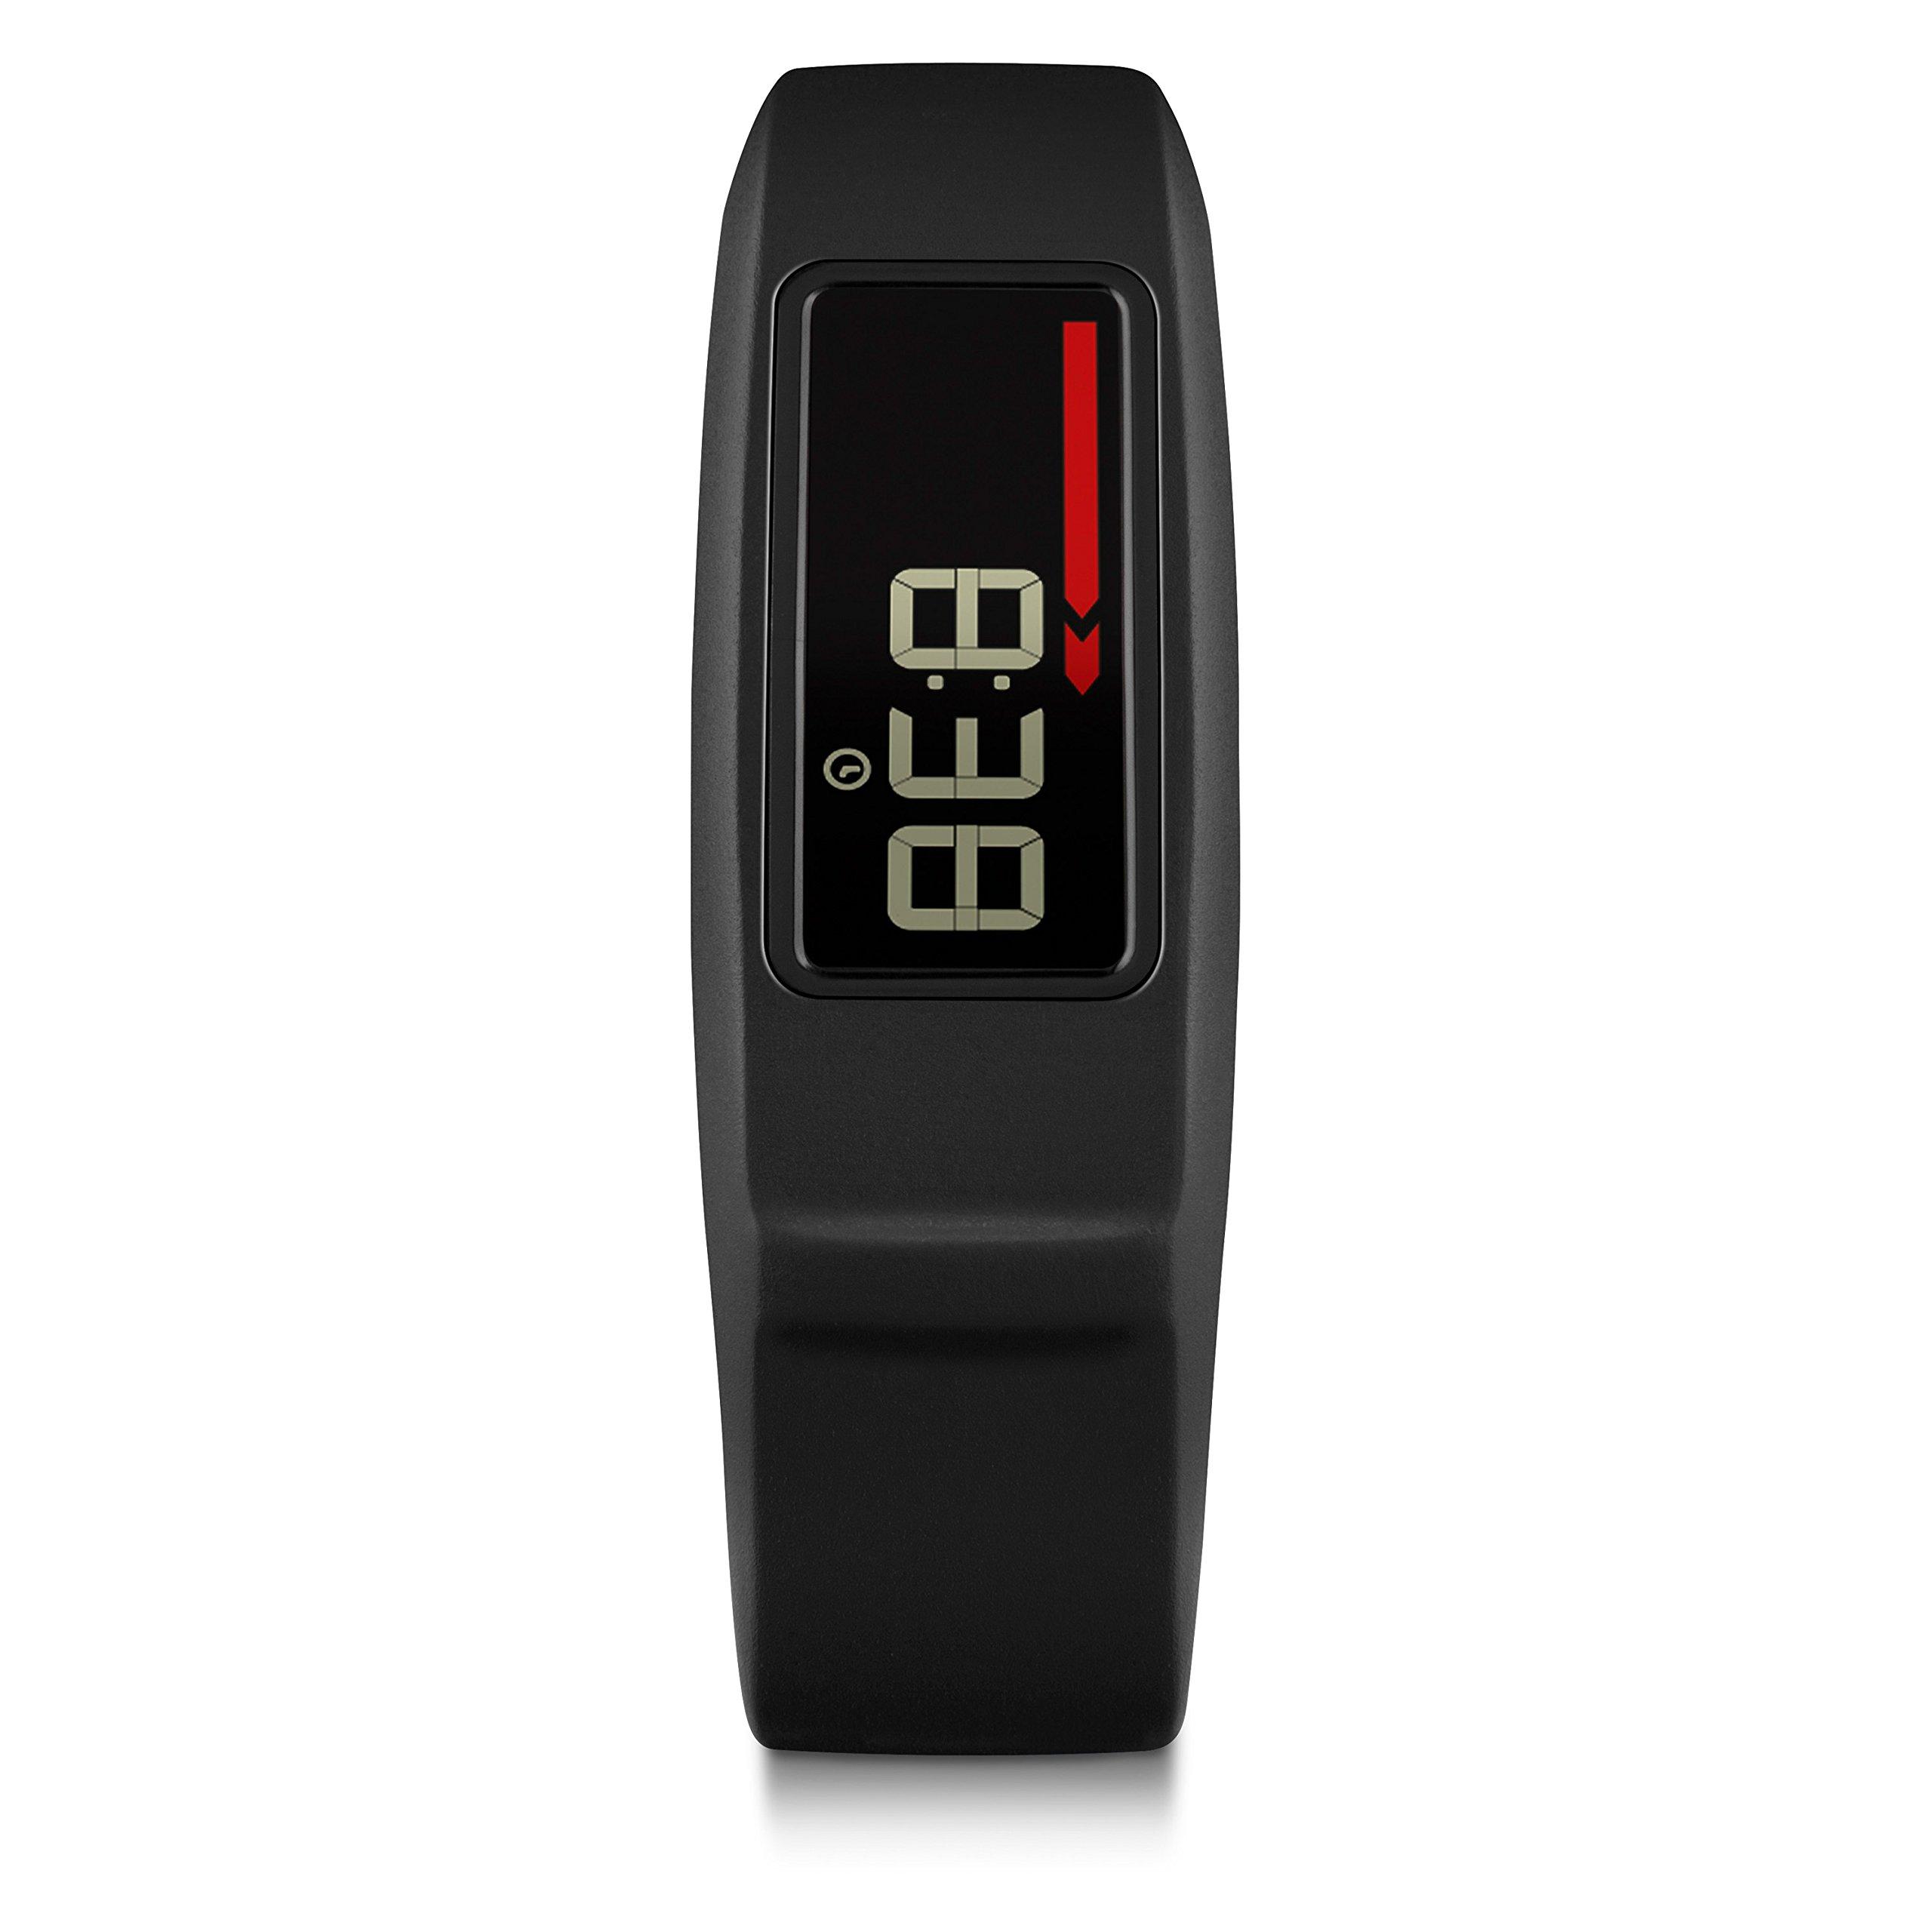 Garmin vívofit 2 Activity Tracker, Black by Garmin (Image #3)